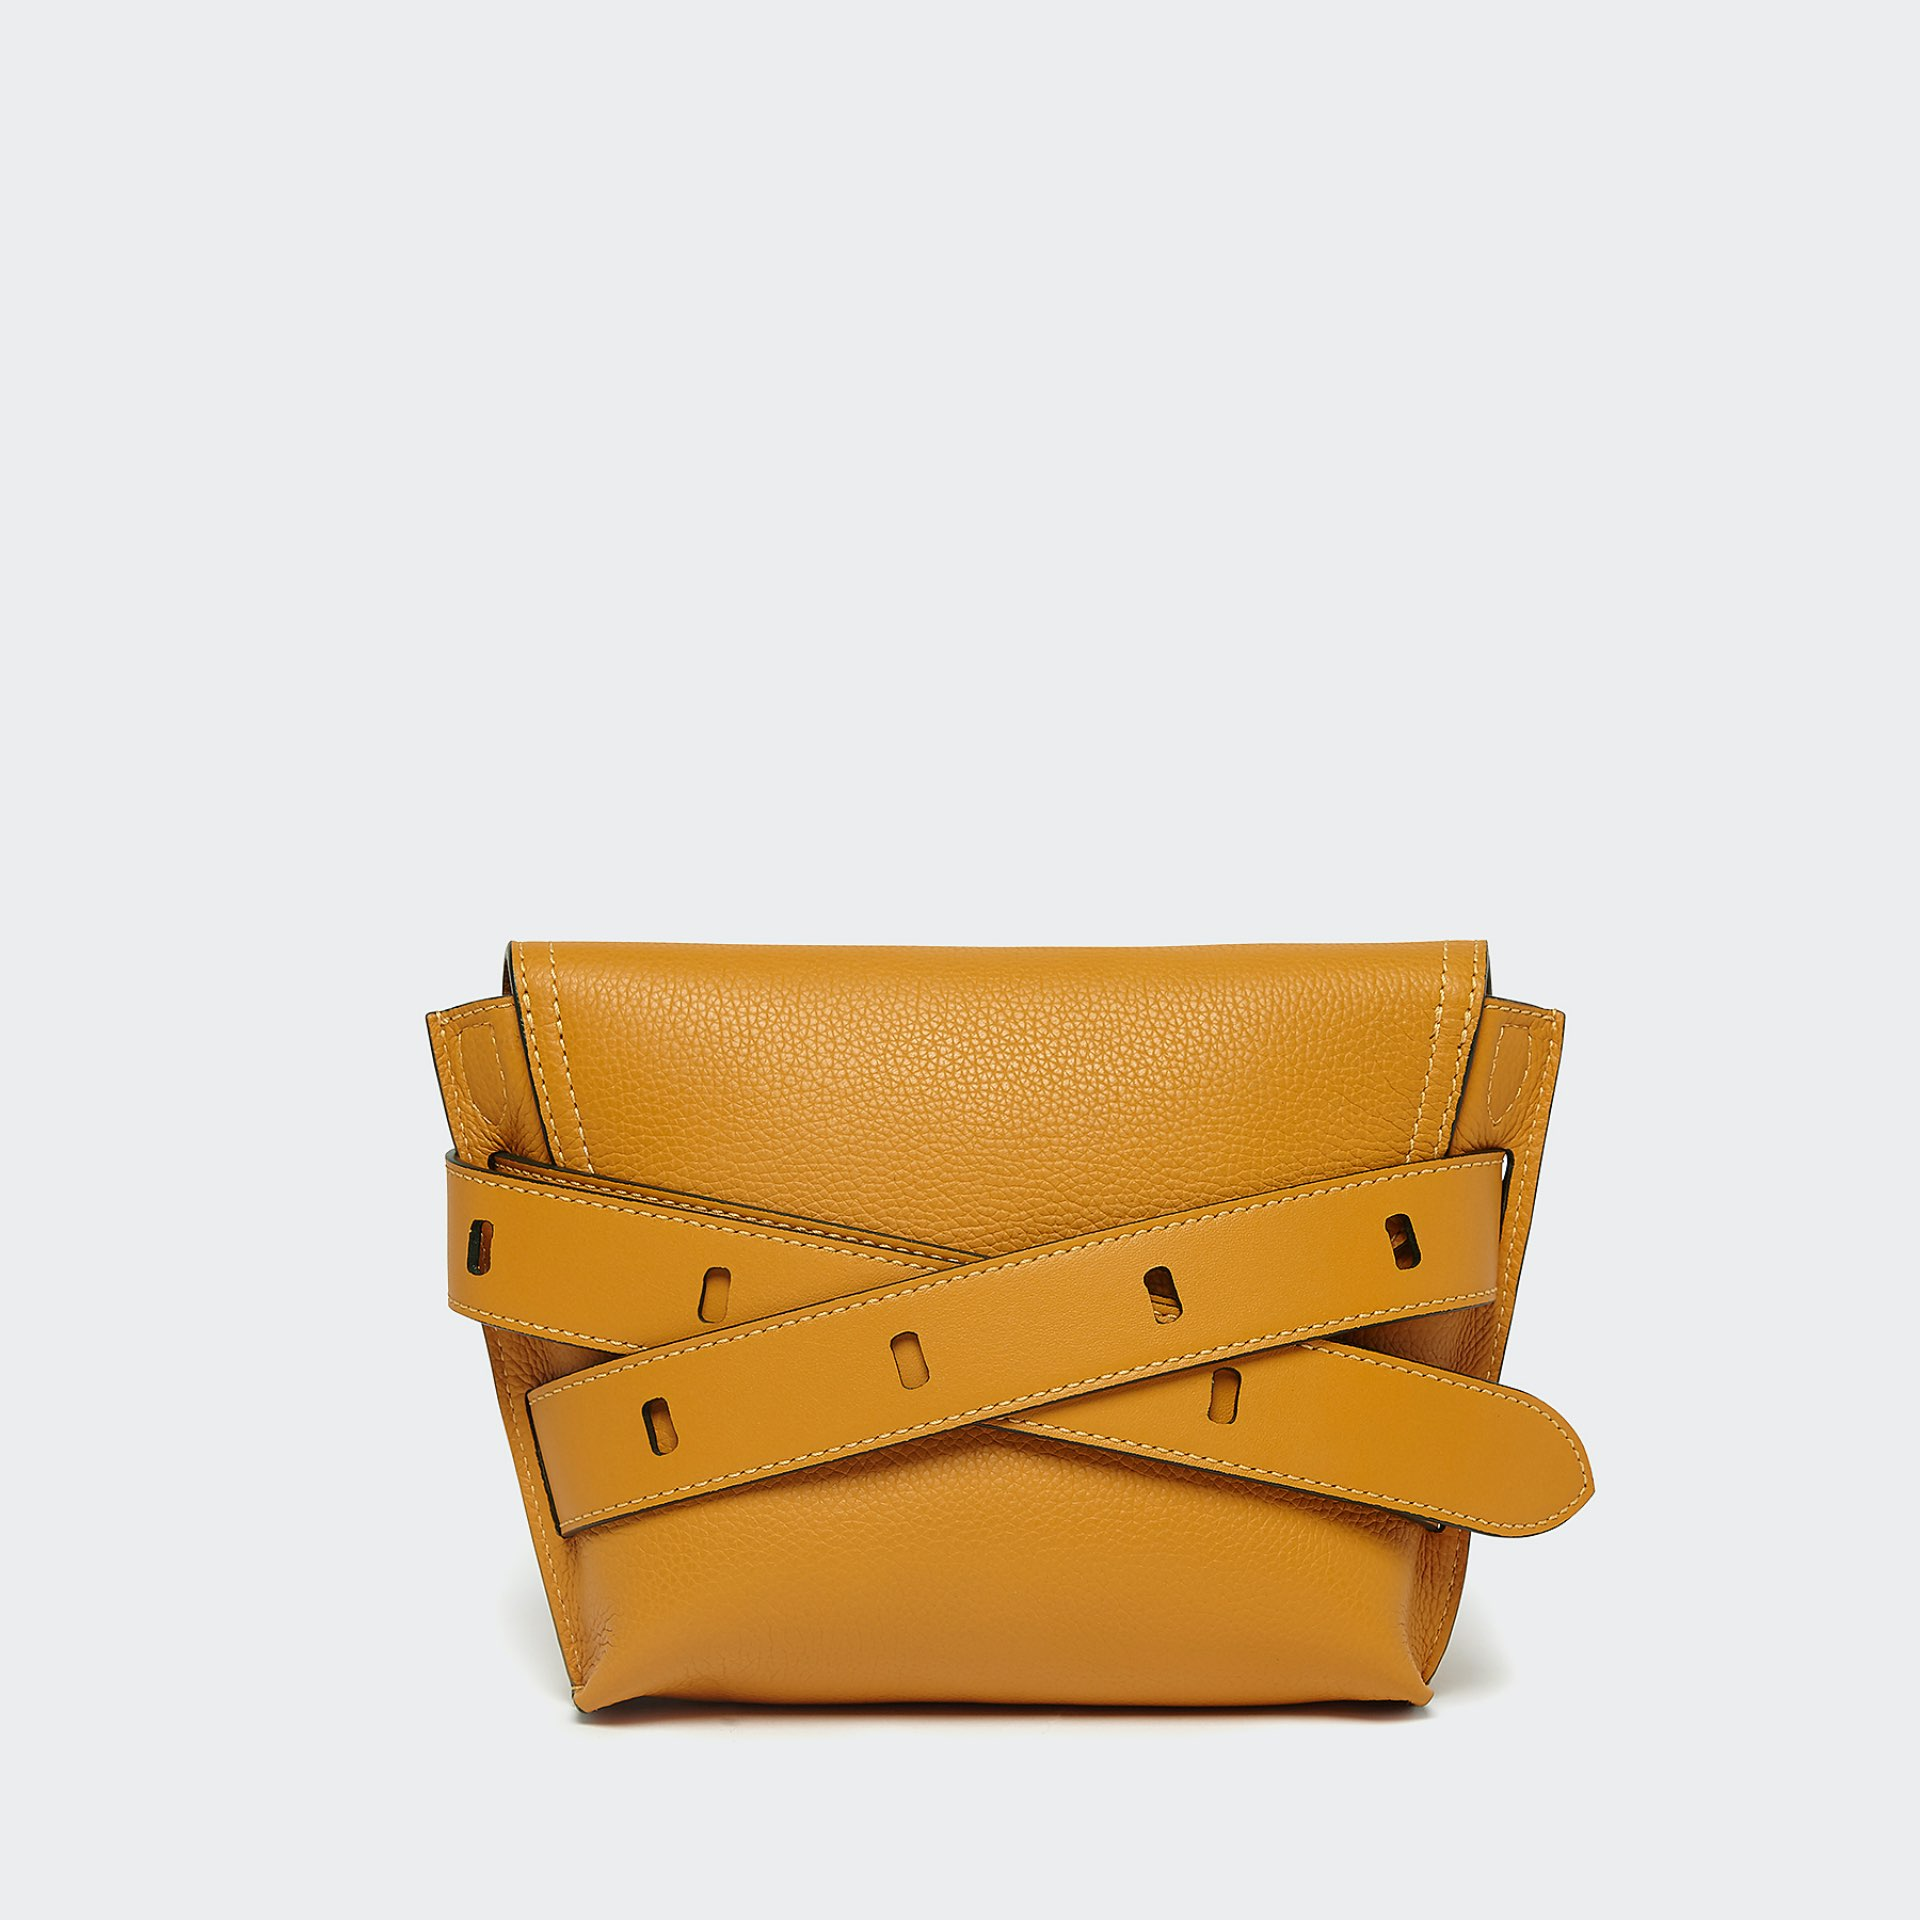 J&M mustard yellow small handbag from the back